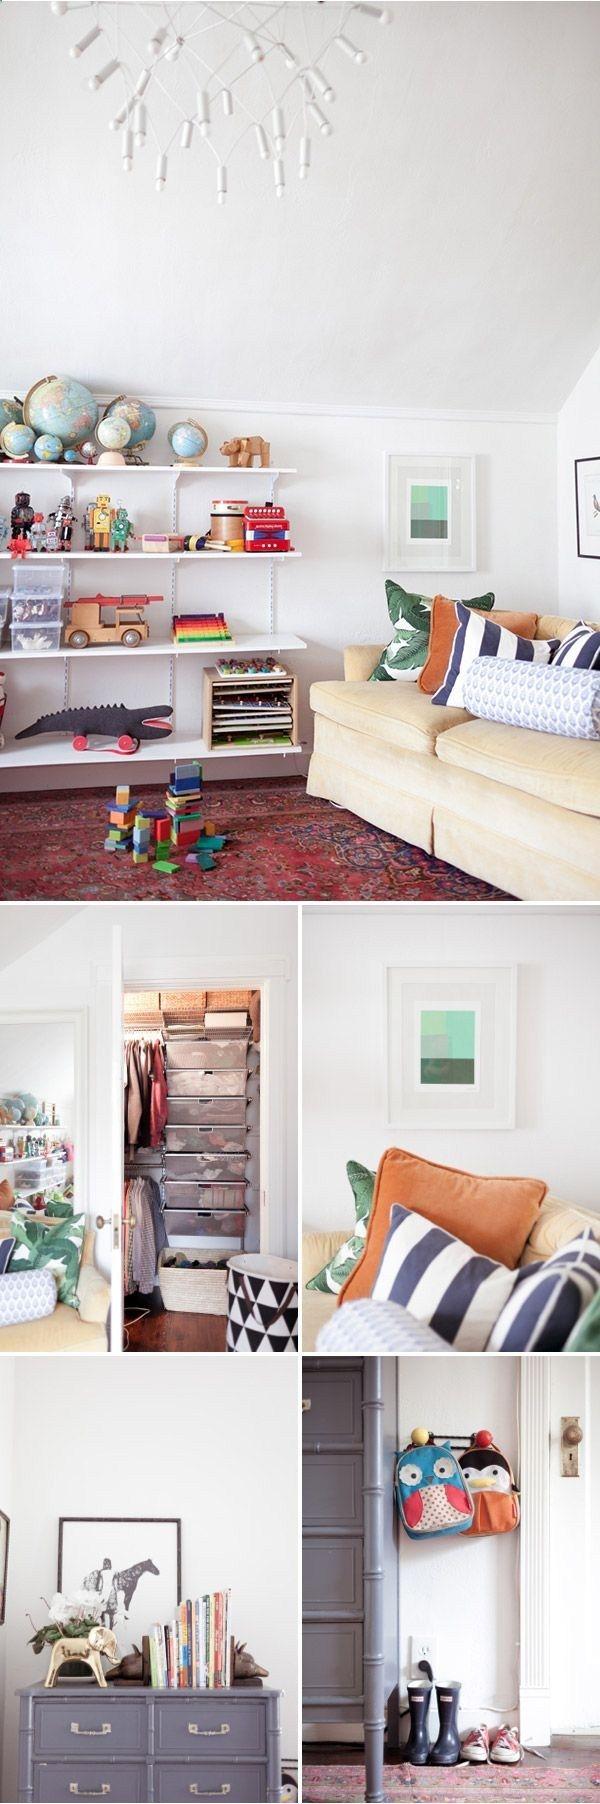 65 best 500 sq apartment idea images on pinterest apartment